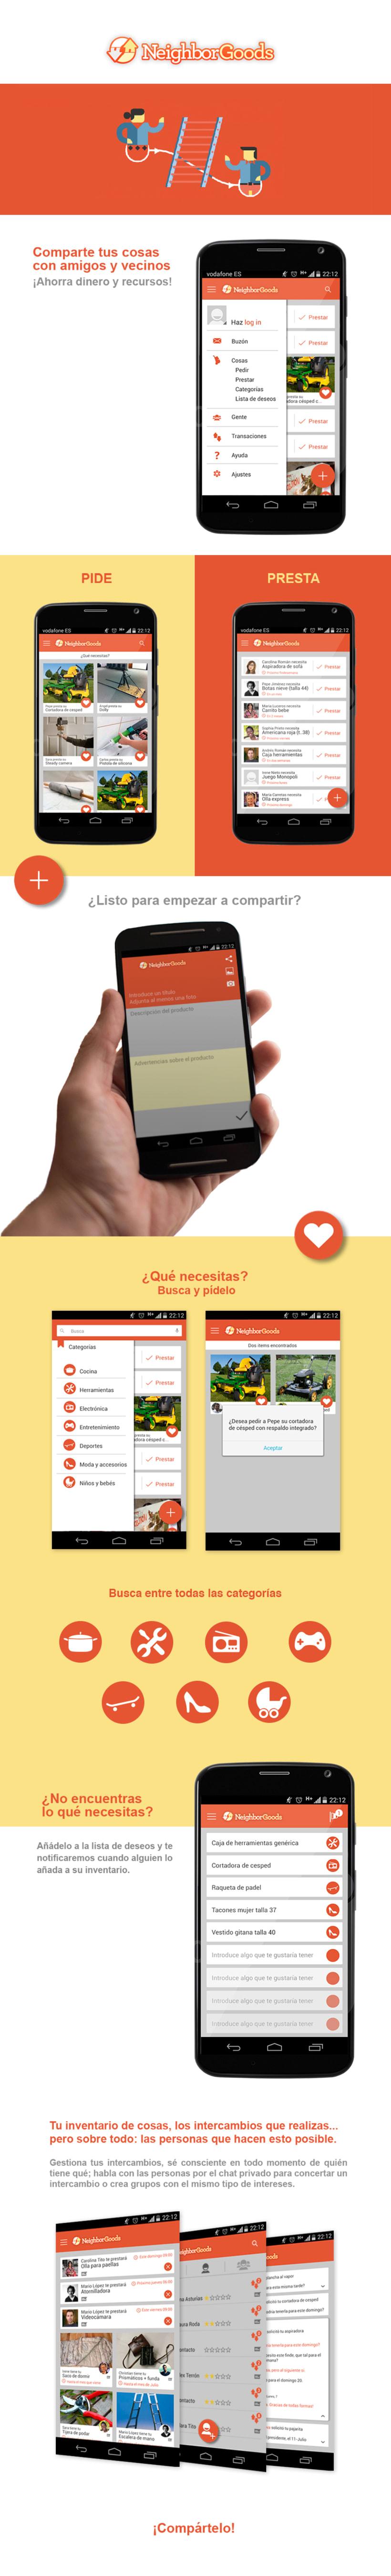 Neighborgoods Android App 0